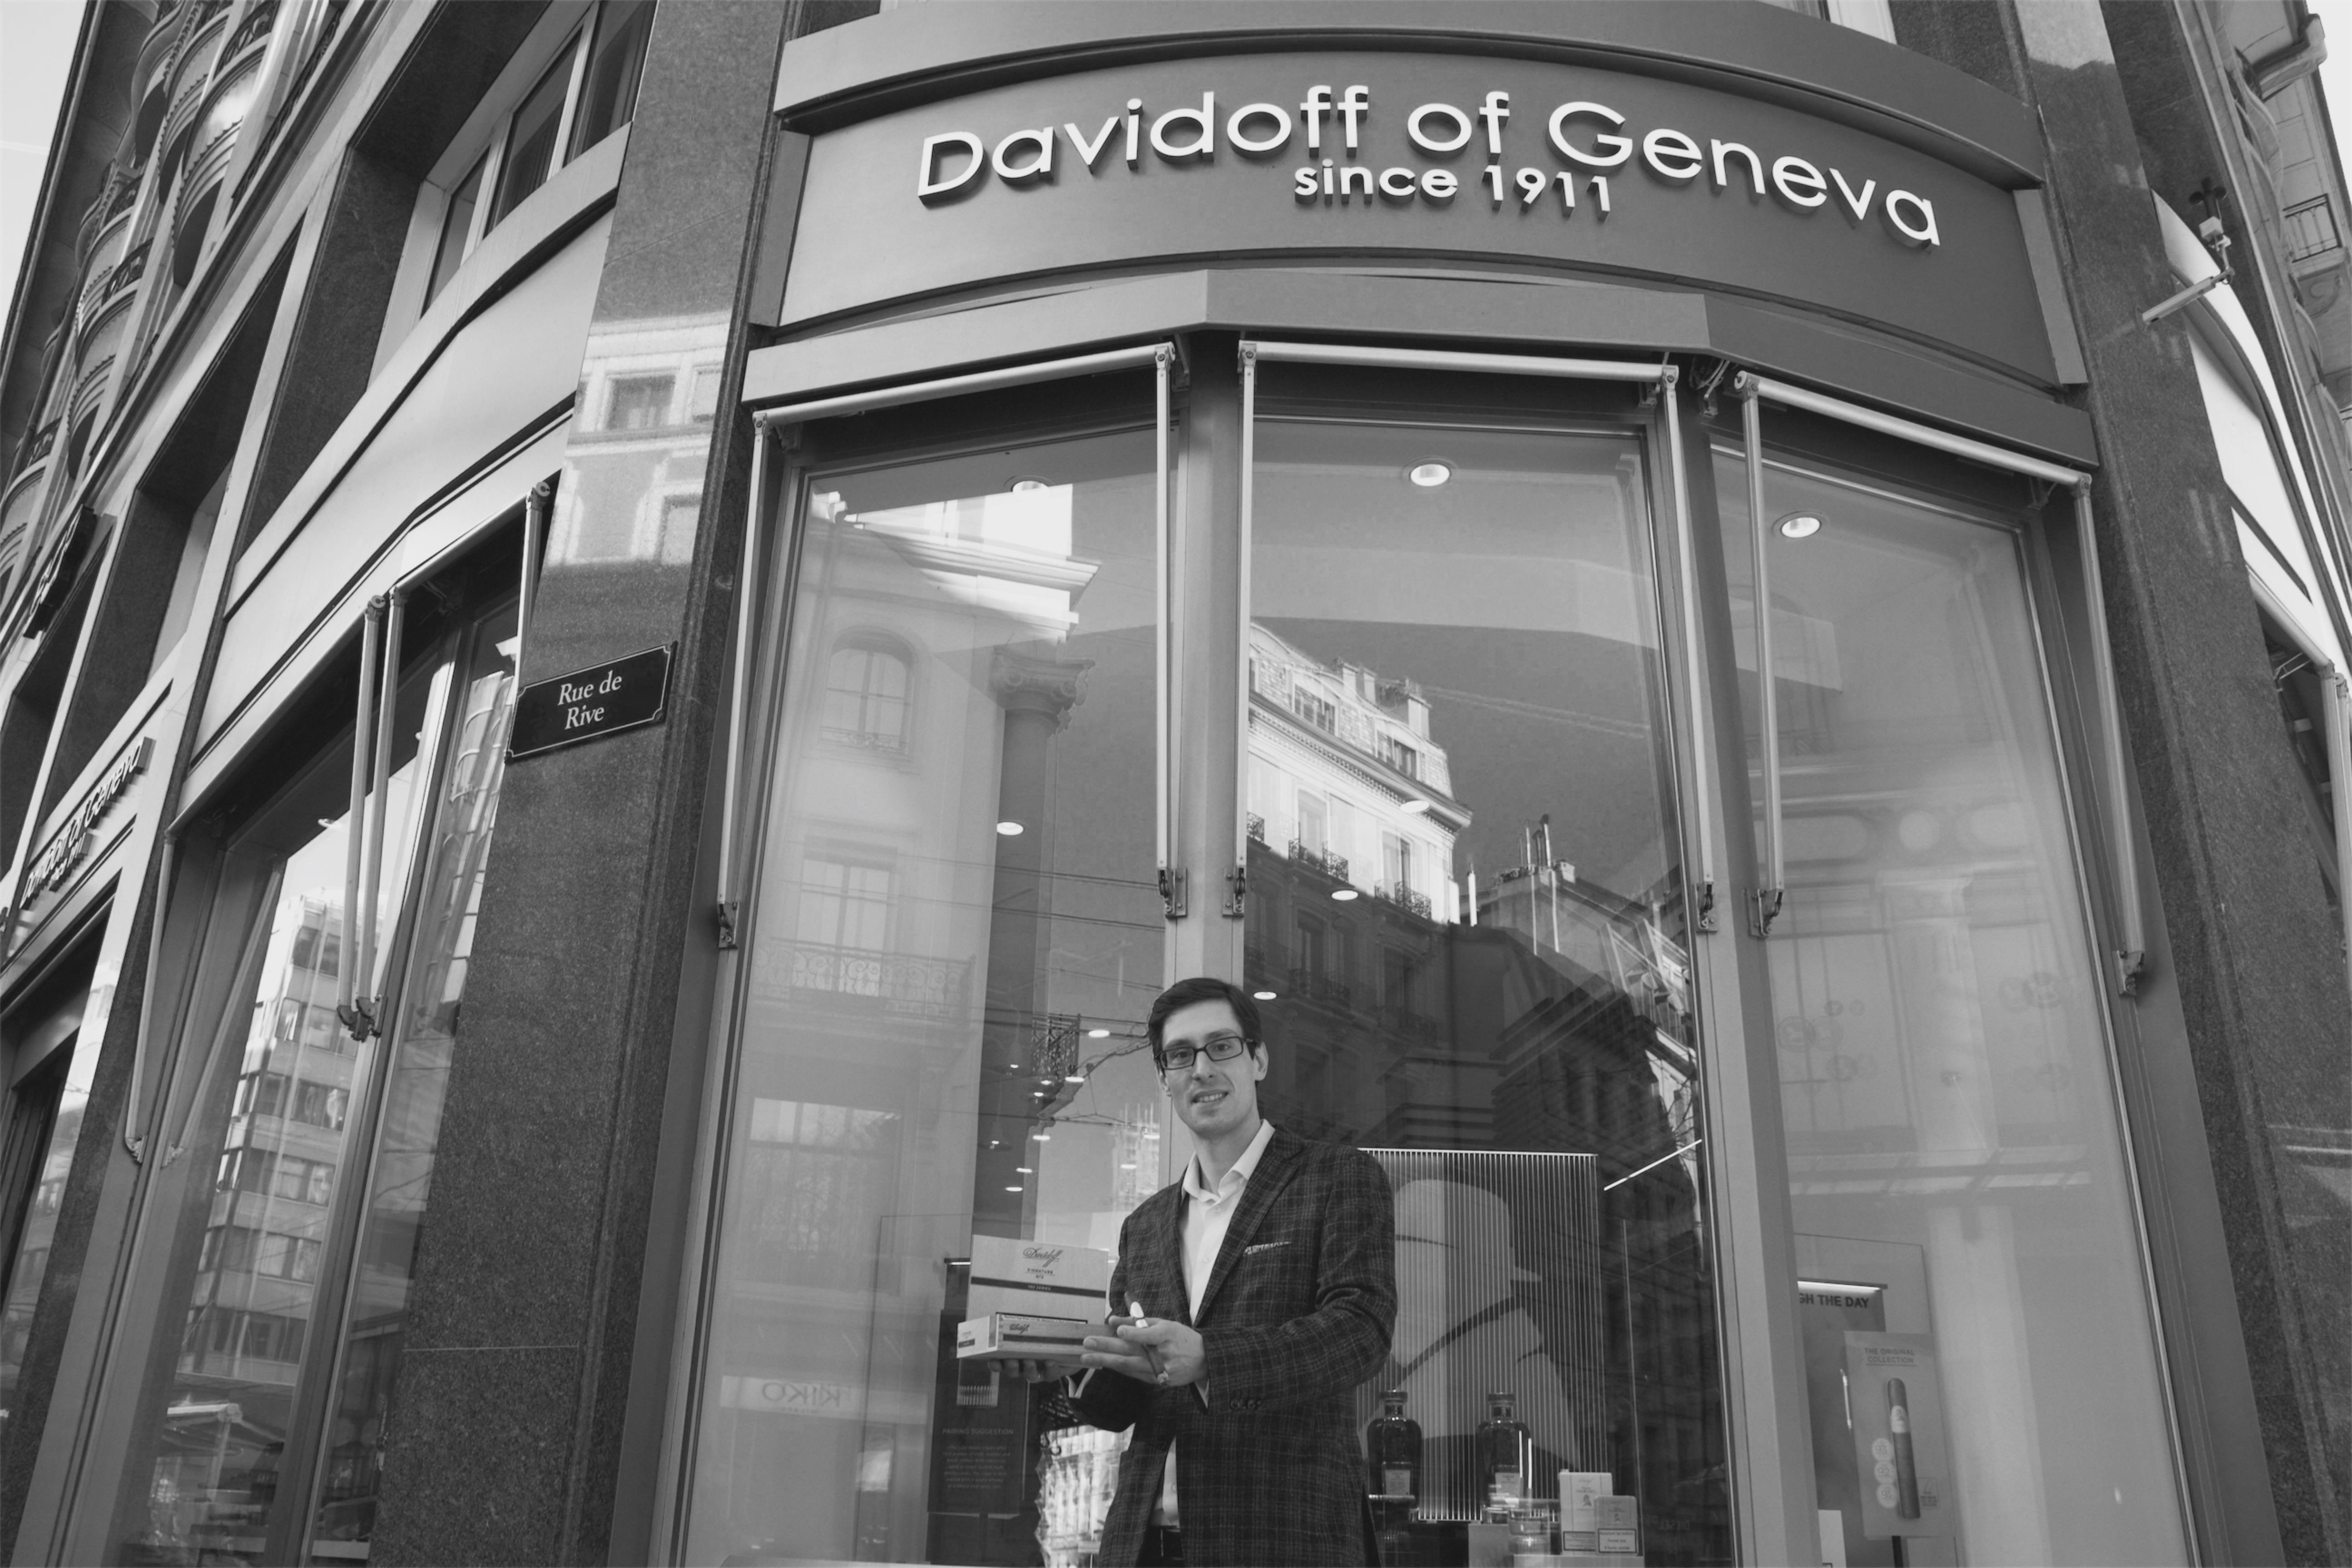 Filip Obara - Manufaktura Marzeń - Davidoff of Geneva